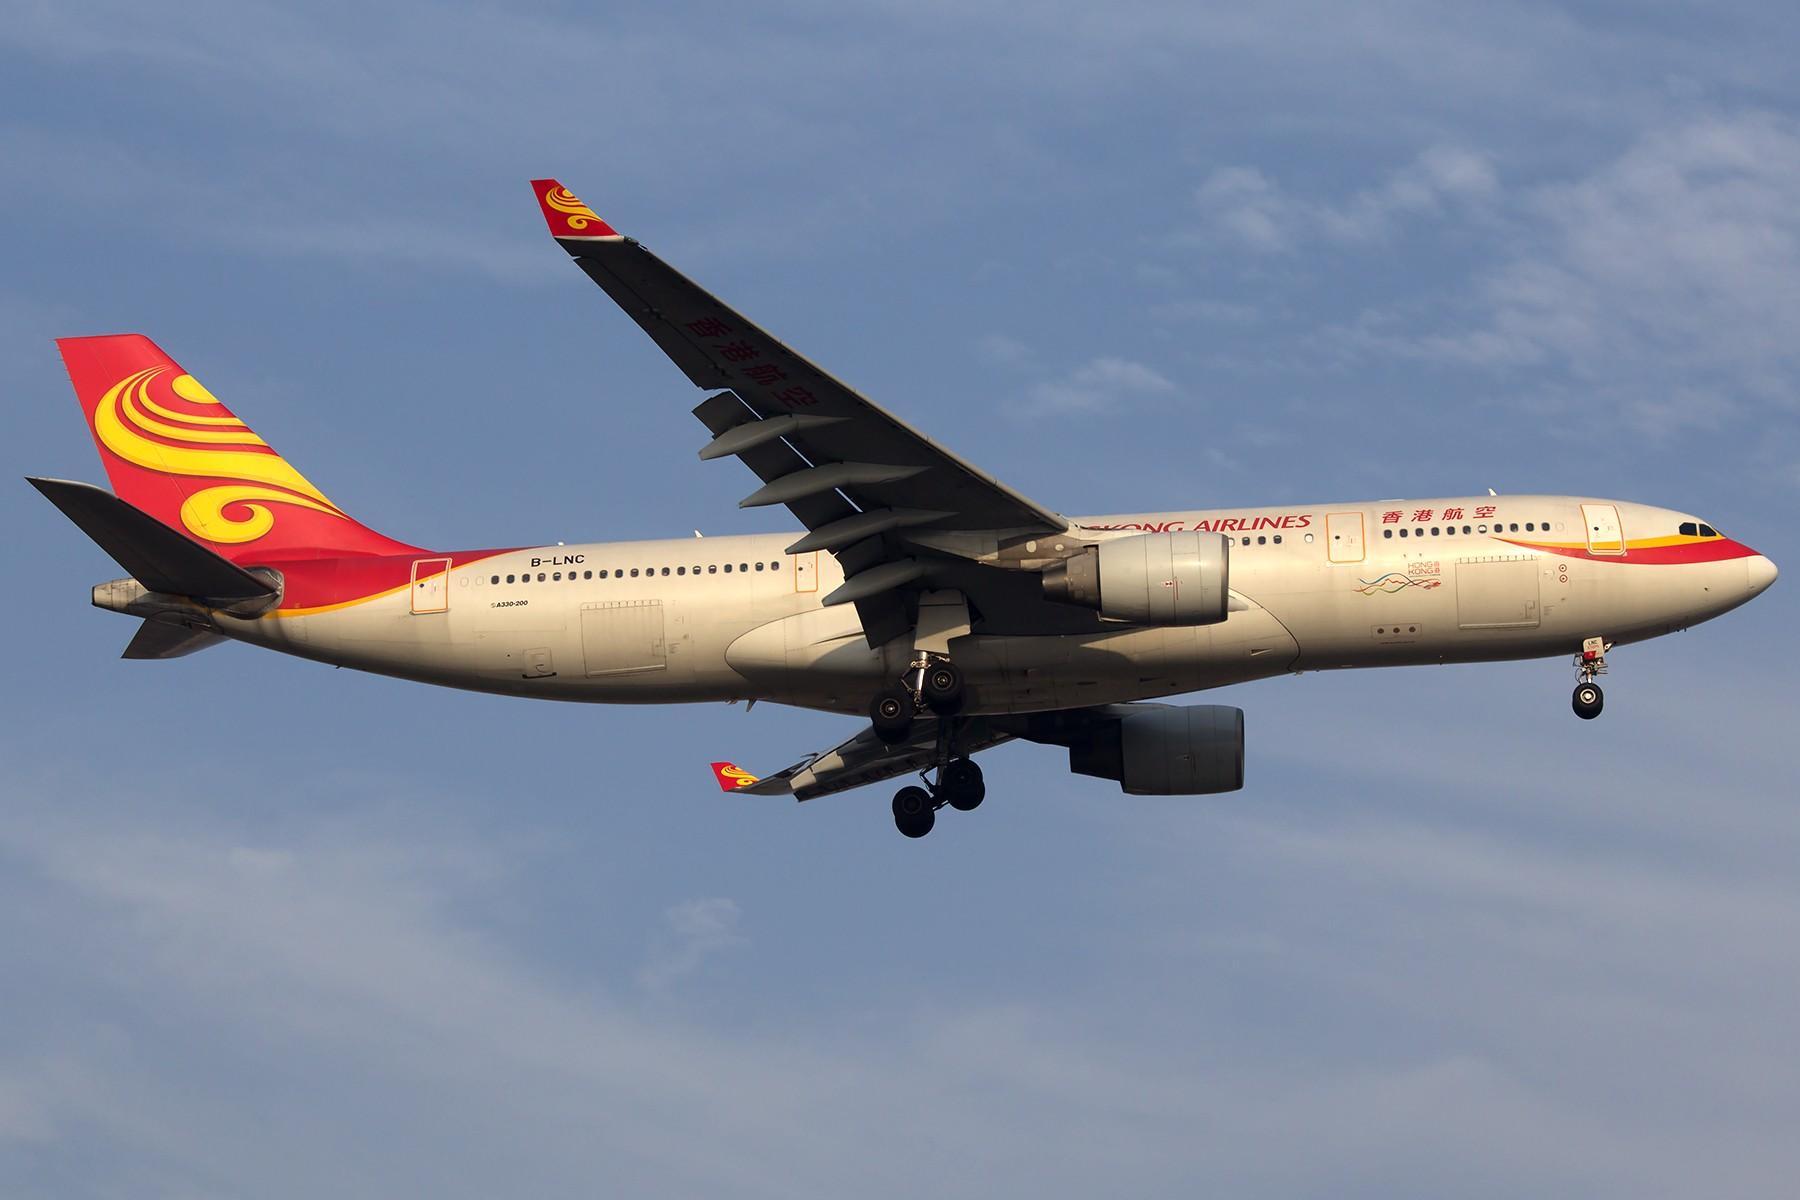 Re:[原创]【1800*1200】浦 东 是 个 大 机 场 AIRBUS A330-200 B-LNC 中国上海浦东国际机场